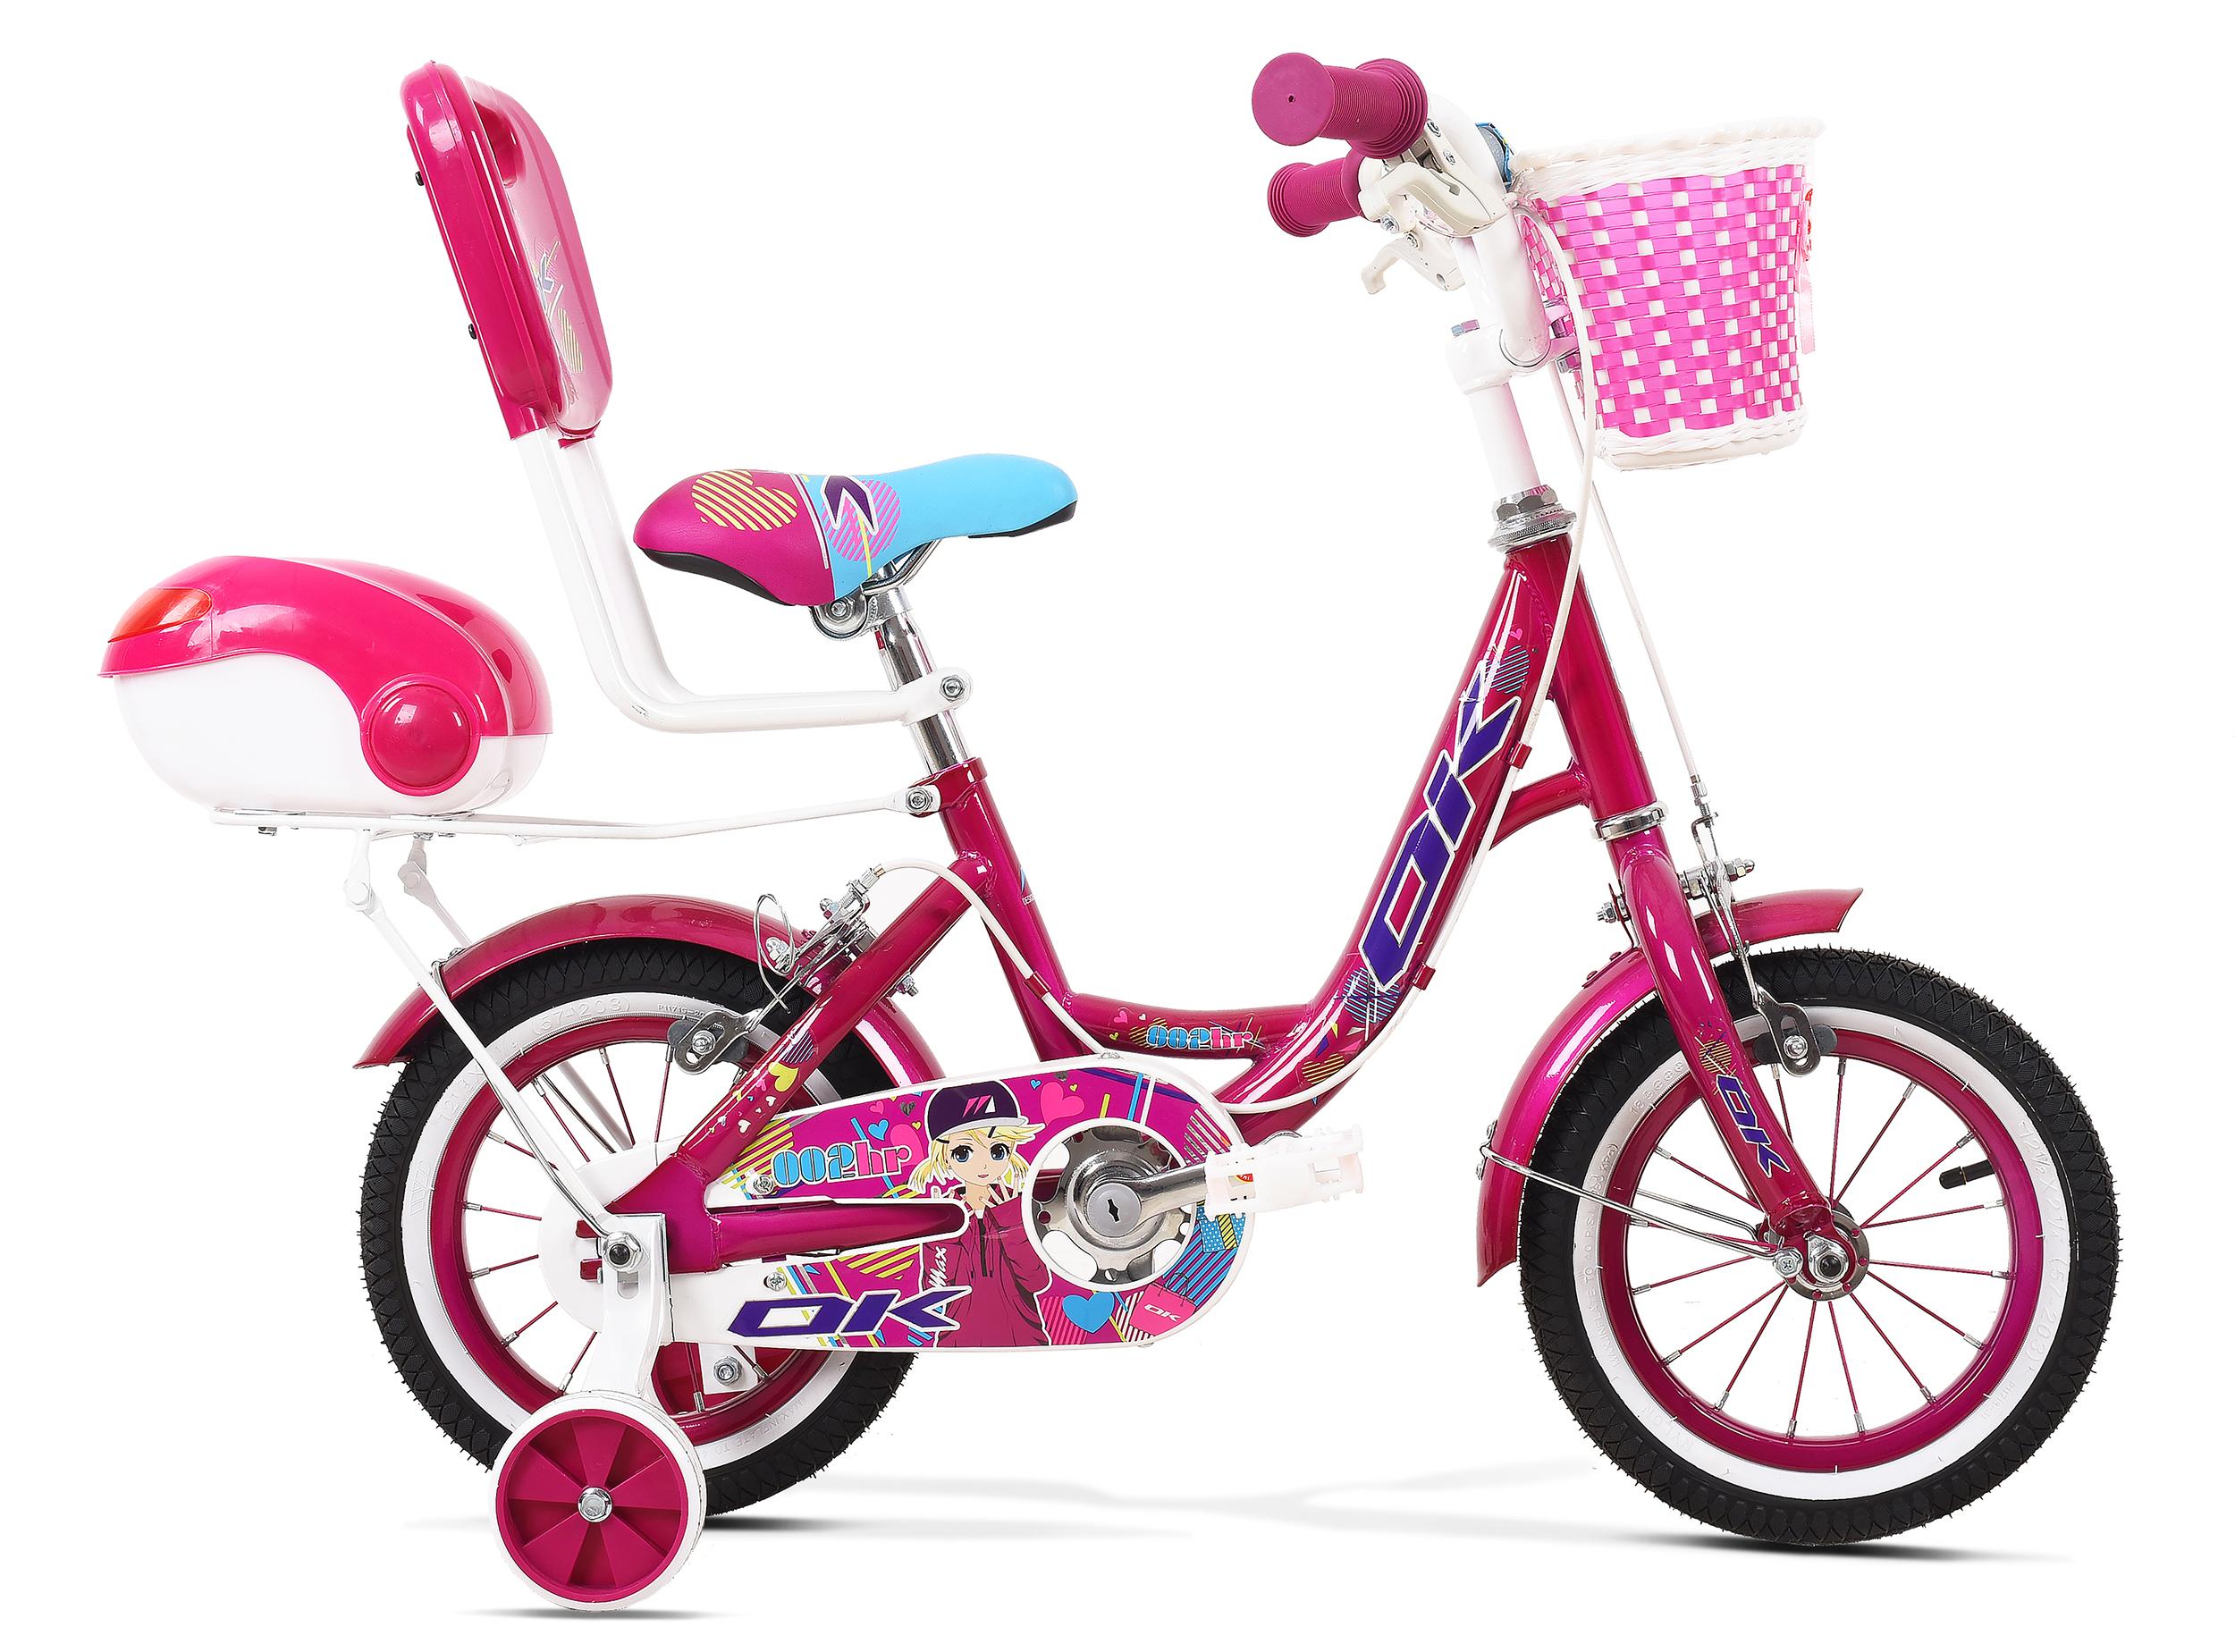 دوچرخه سایز 12 مدل K12003HR